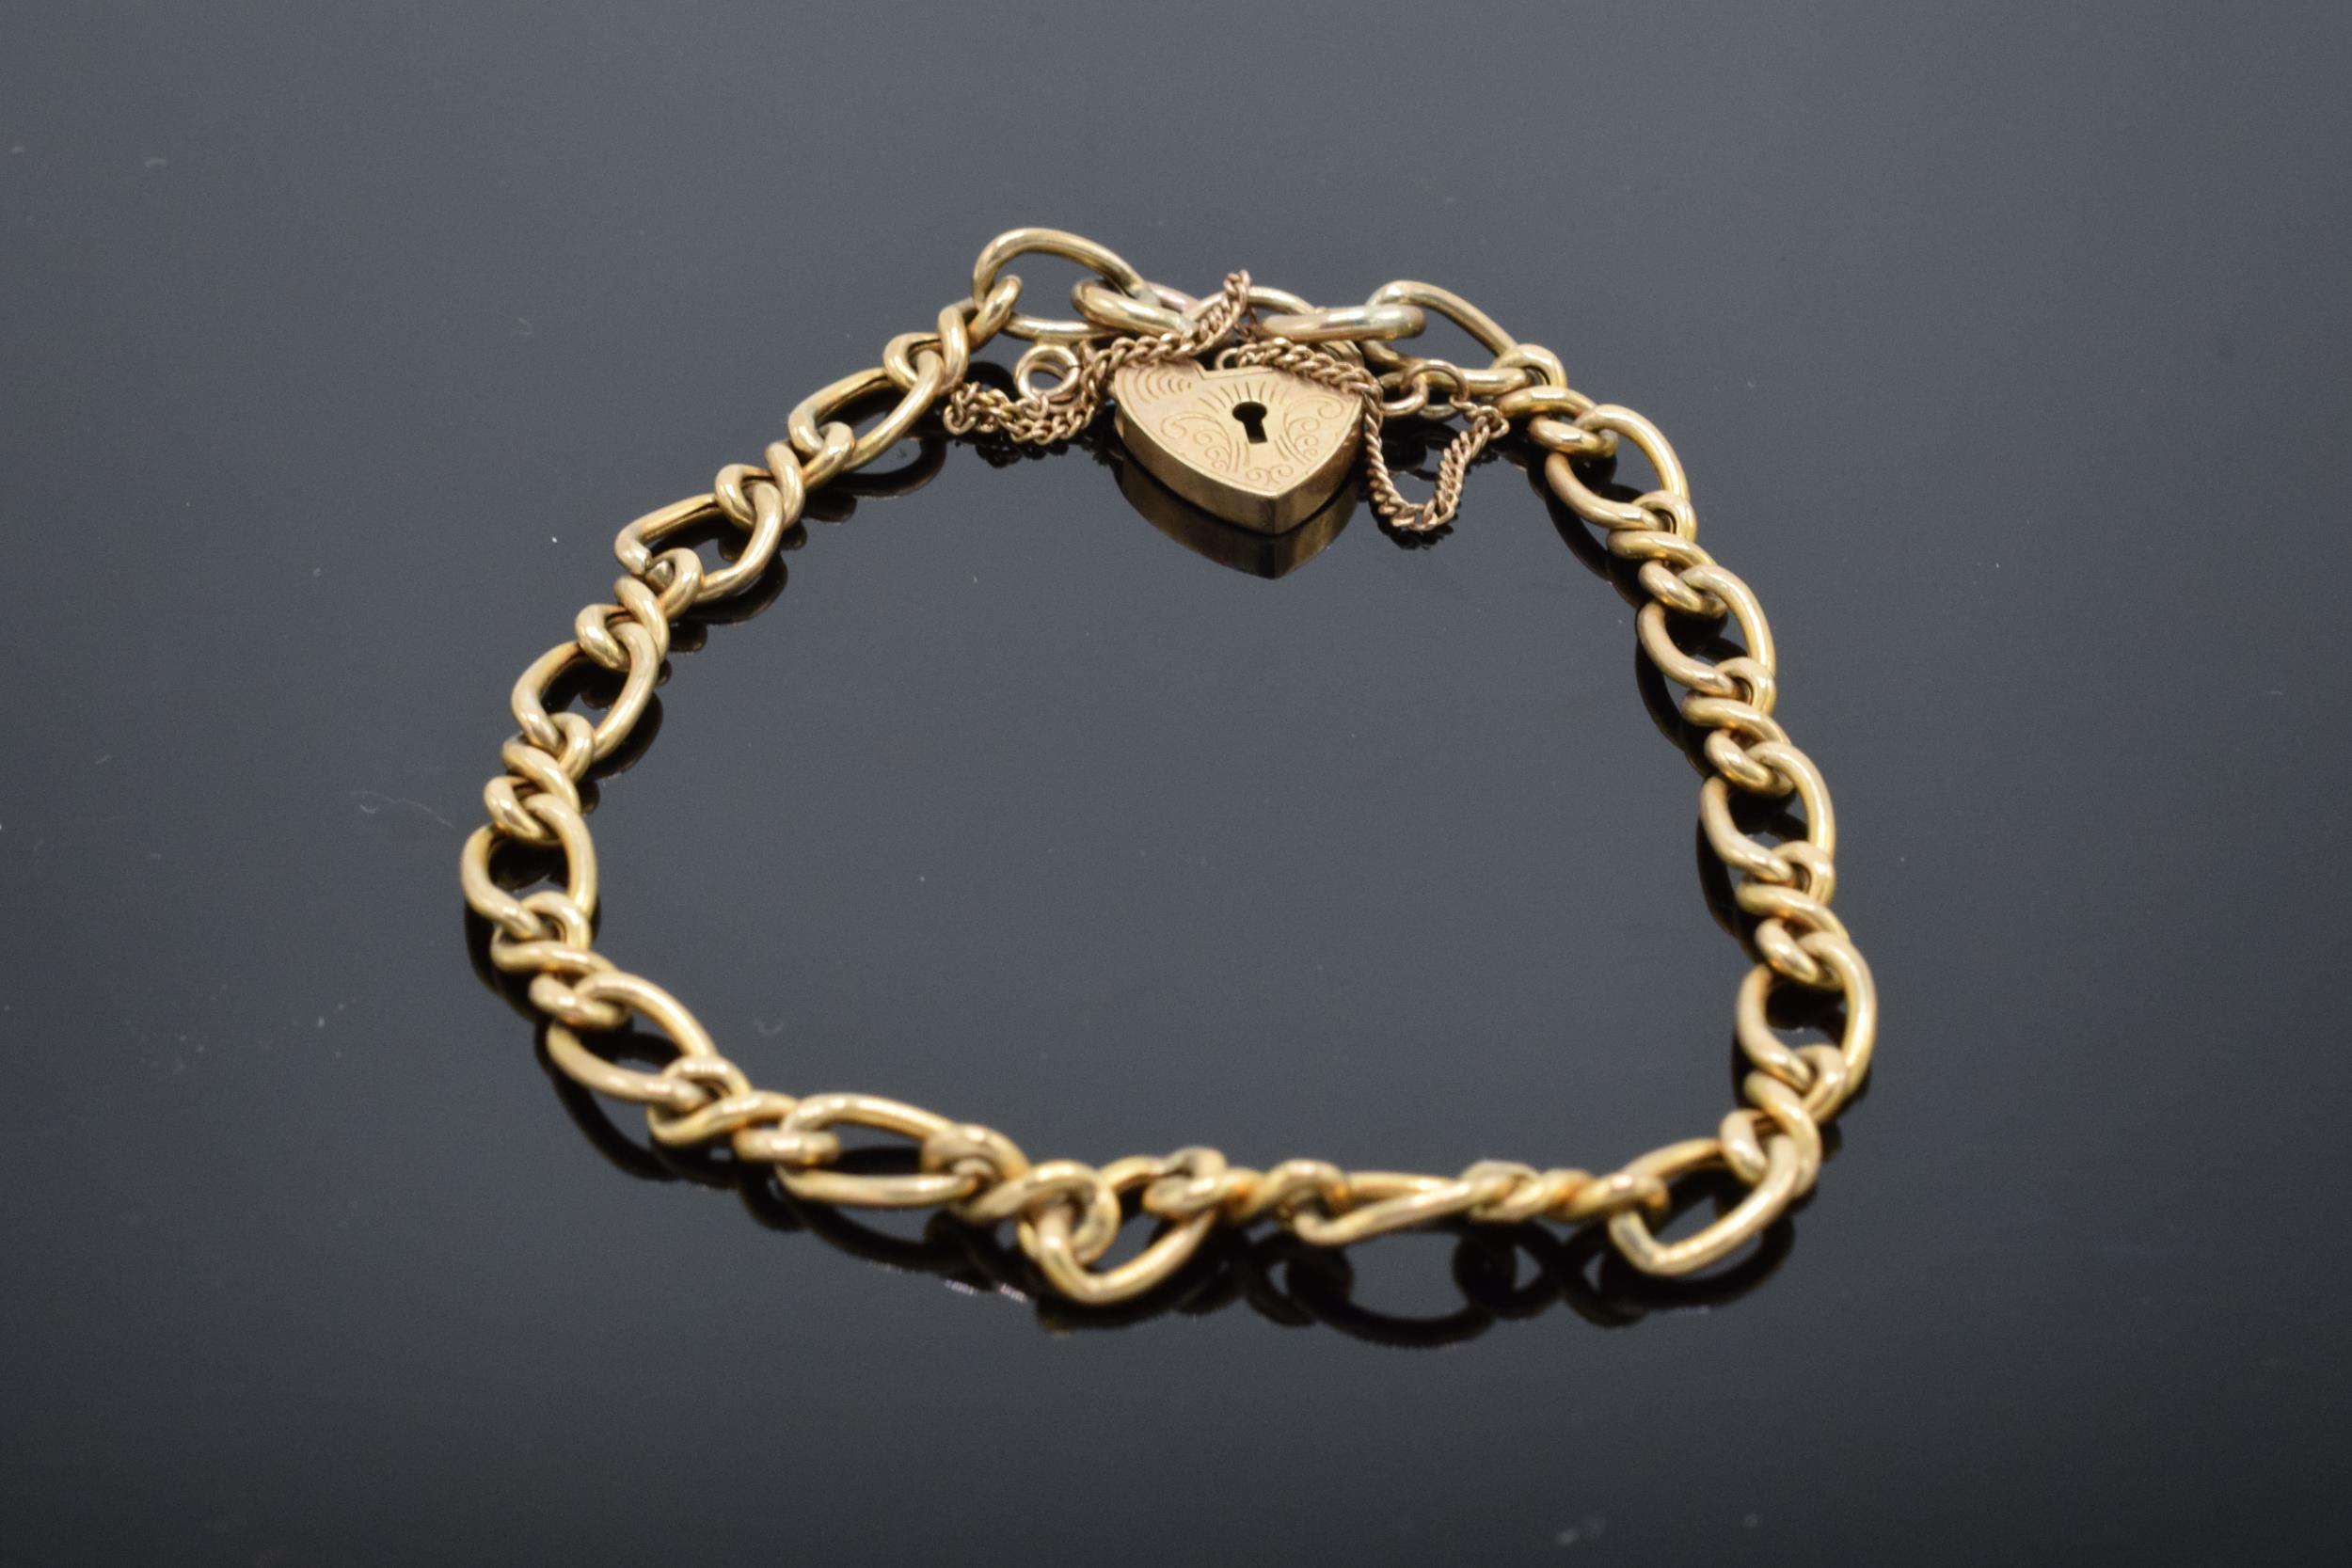 9ct gold charm bracelet 5.2g